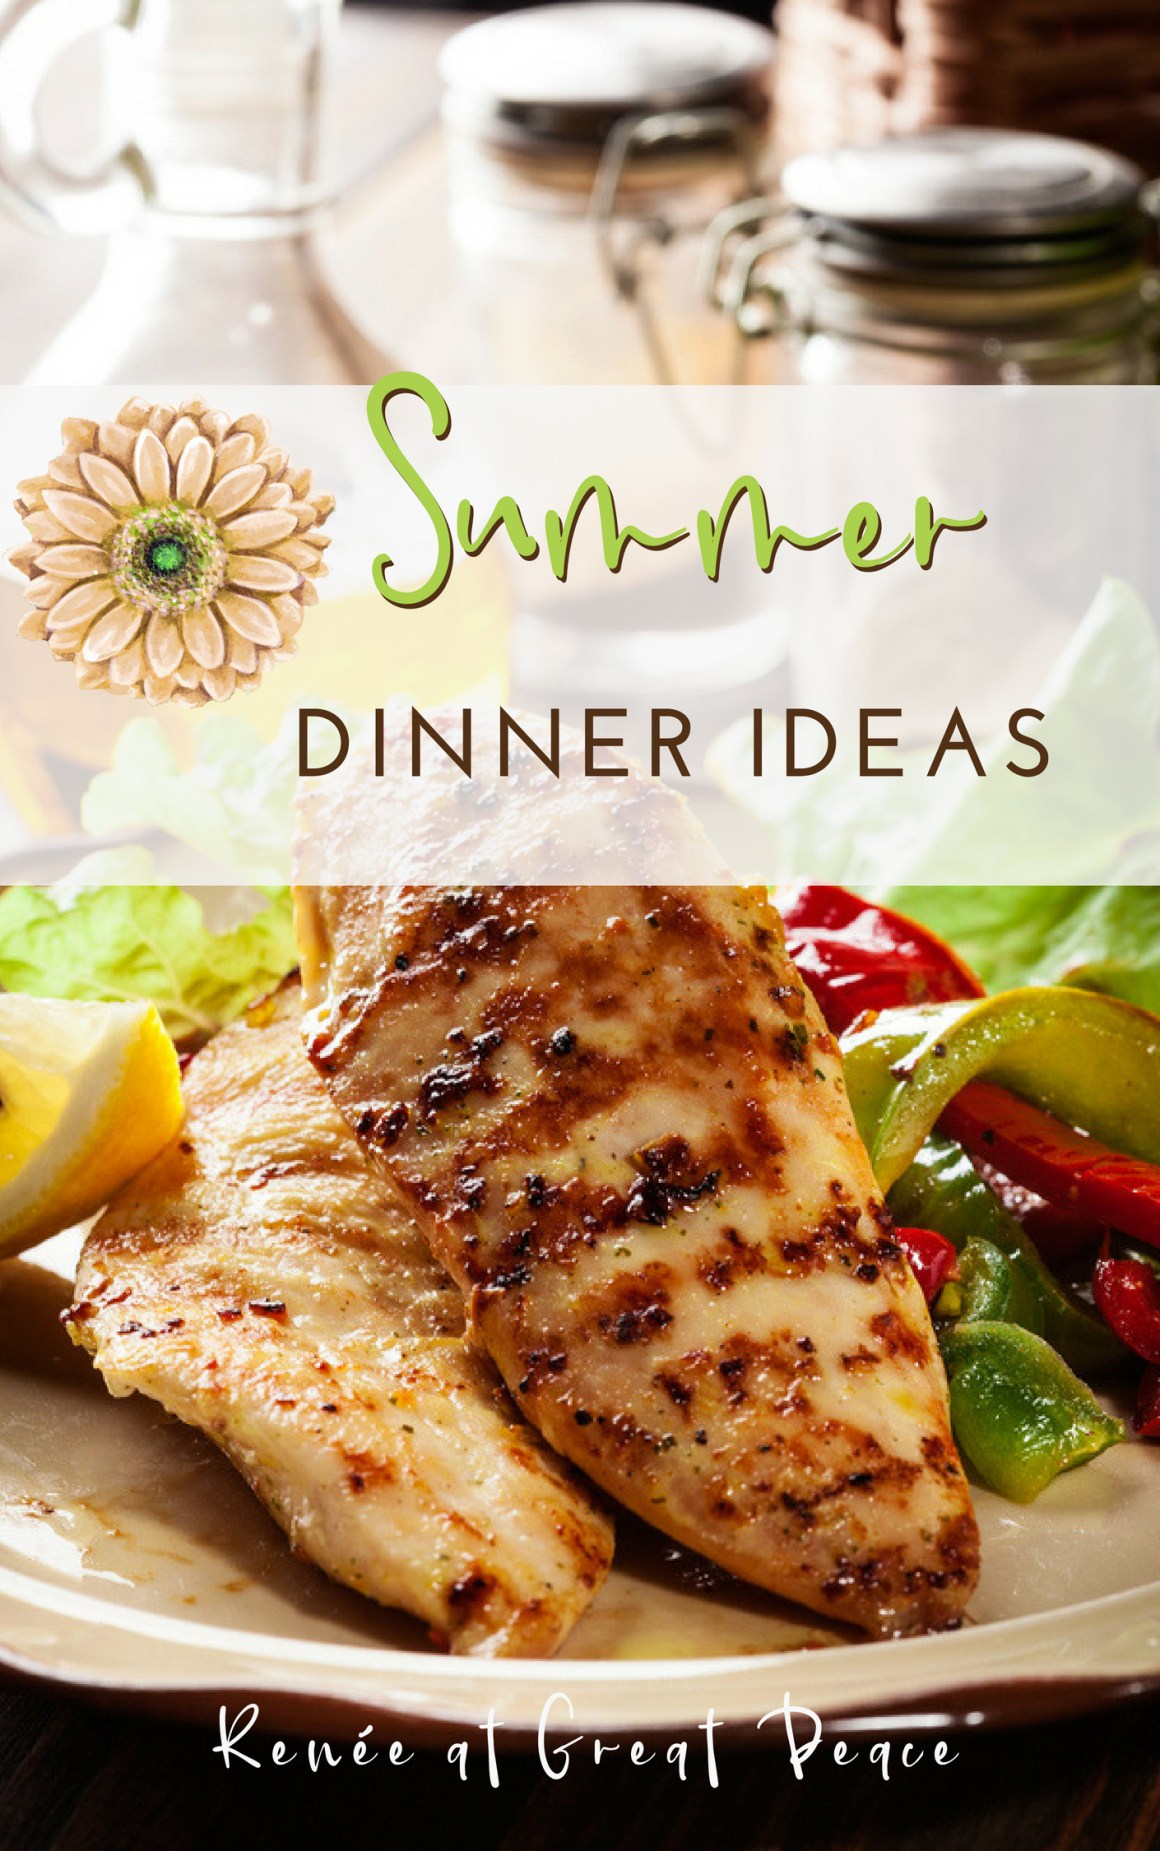 Summer Dinner Ideas | Renée at Great Peace #summerdinner #mealplanning #family